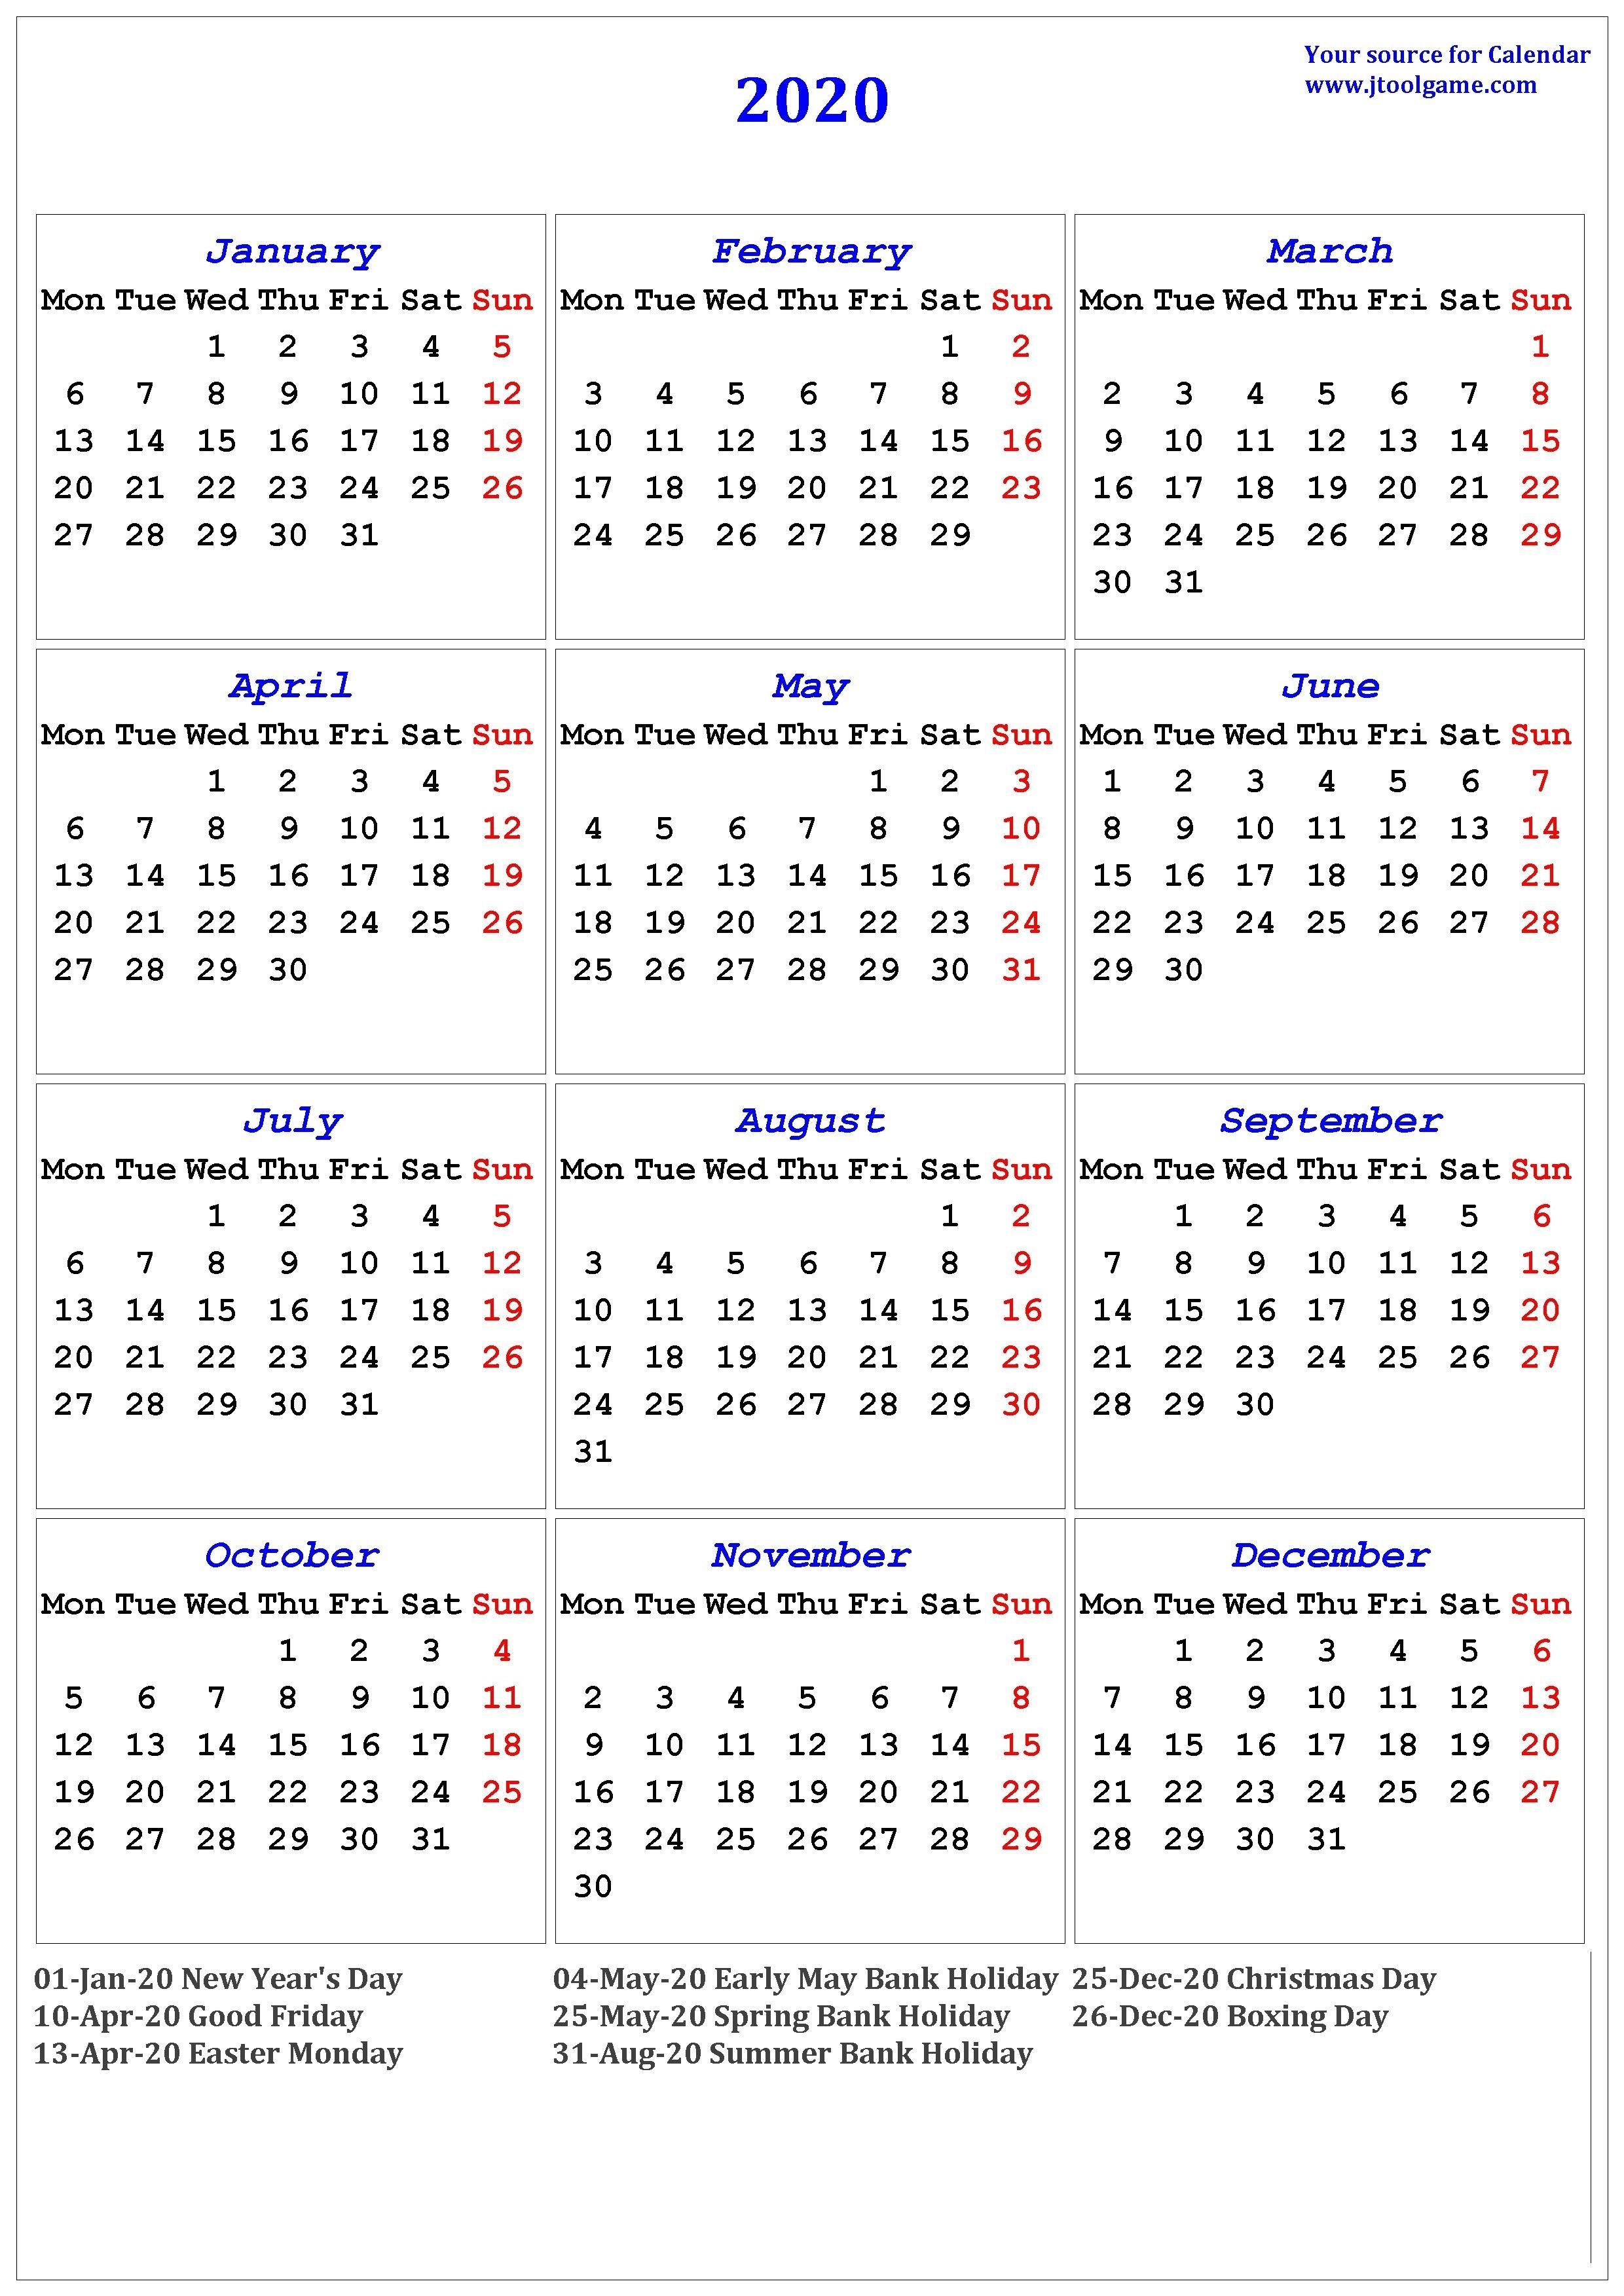 2020 Calendar - Printable Calendar. 2020 Calendar In-2020 Holidays Printable List